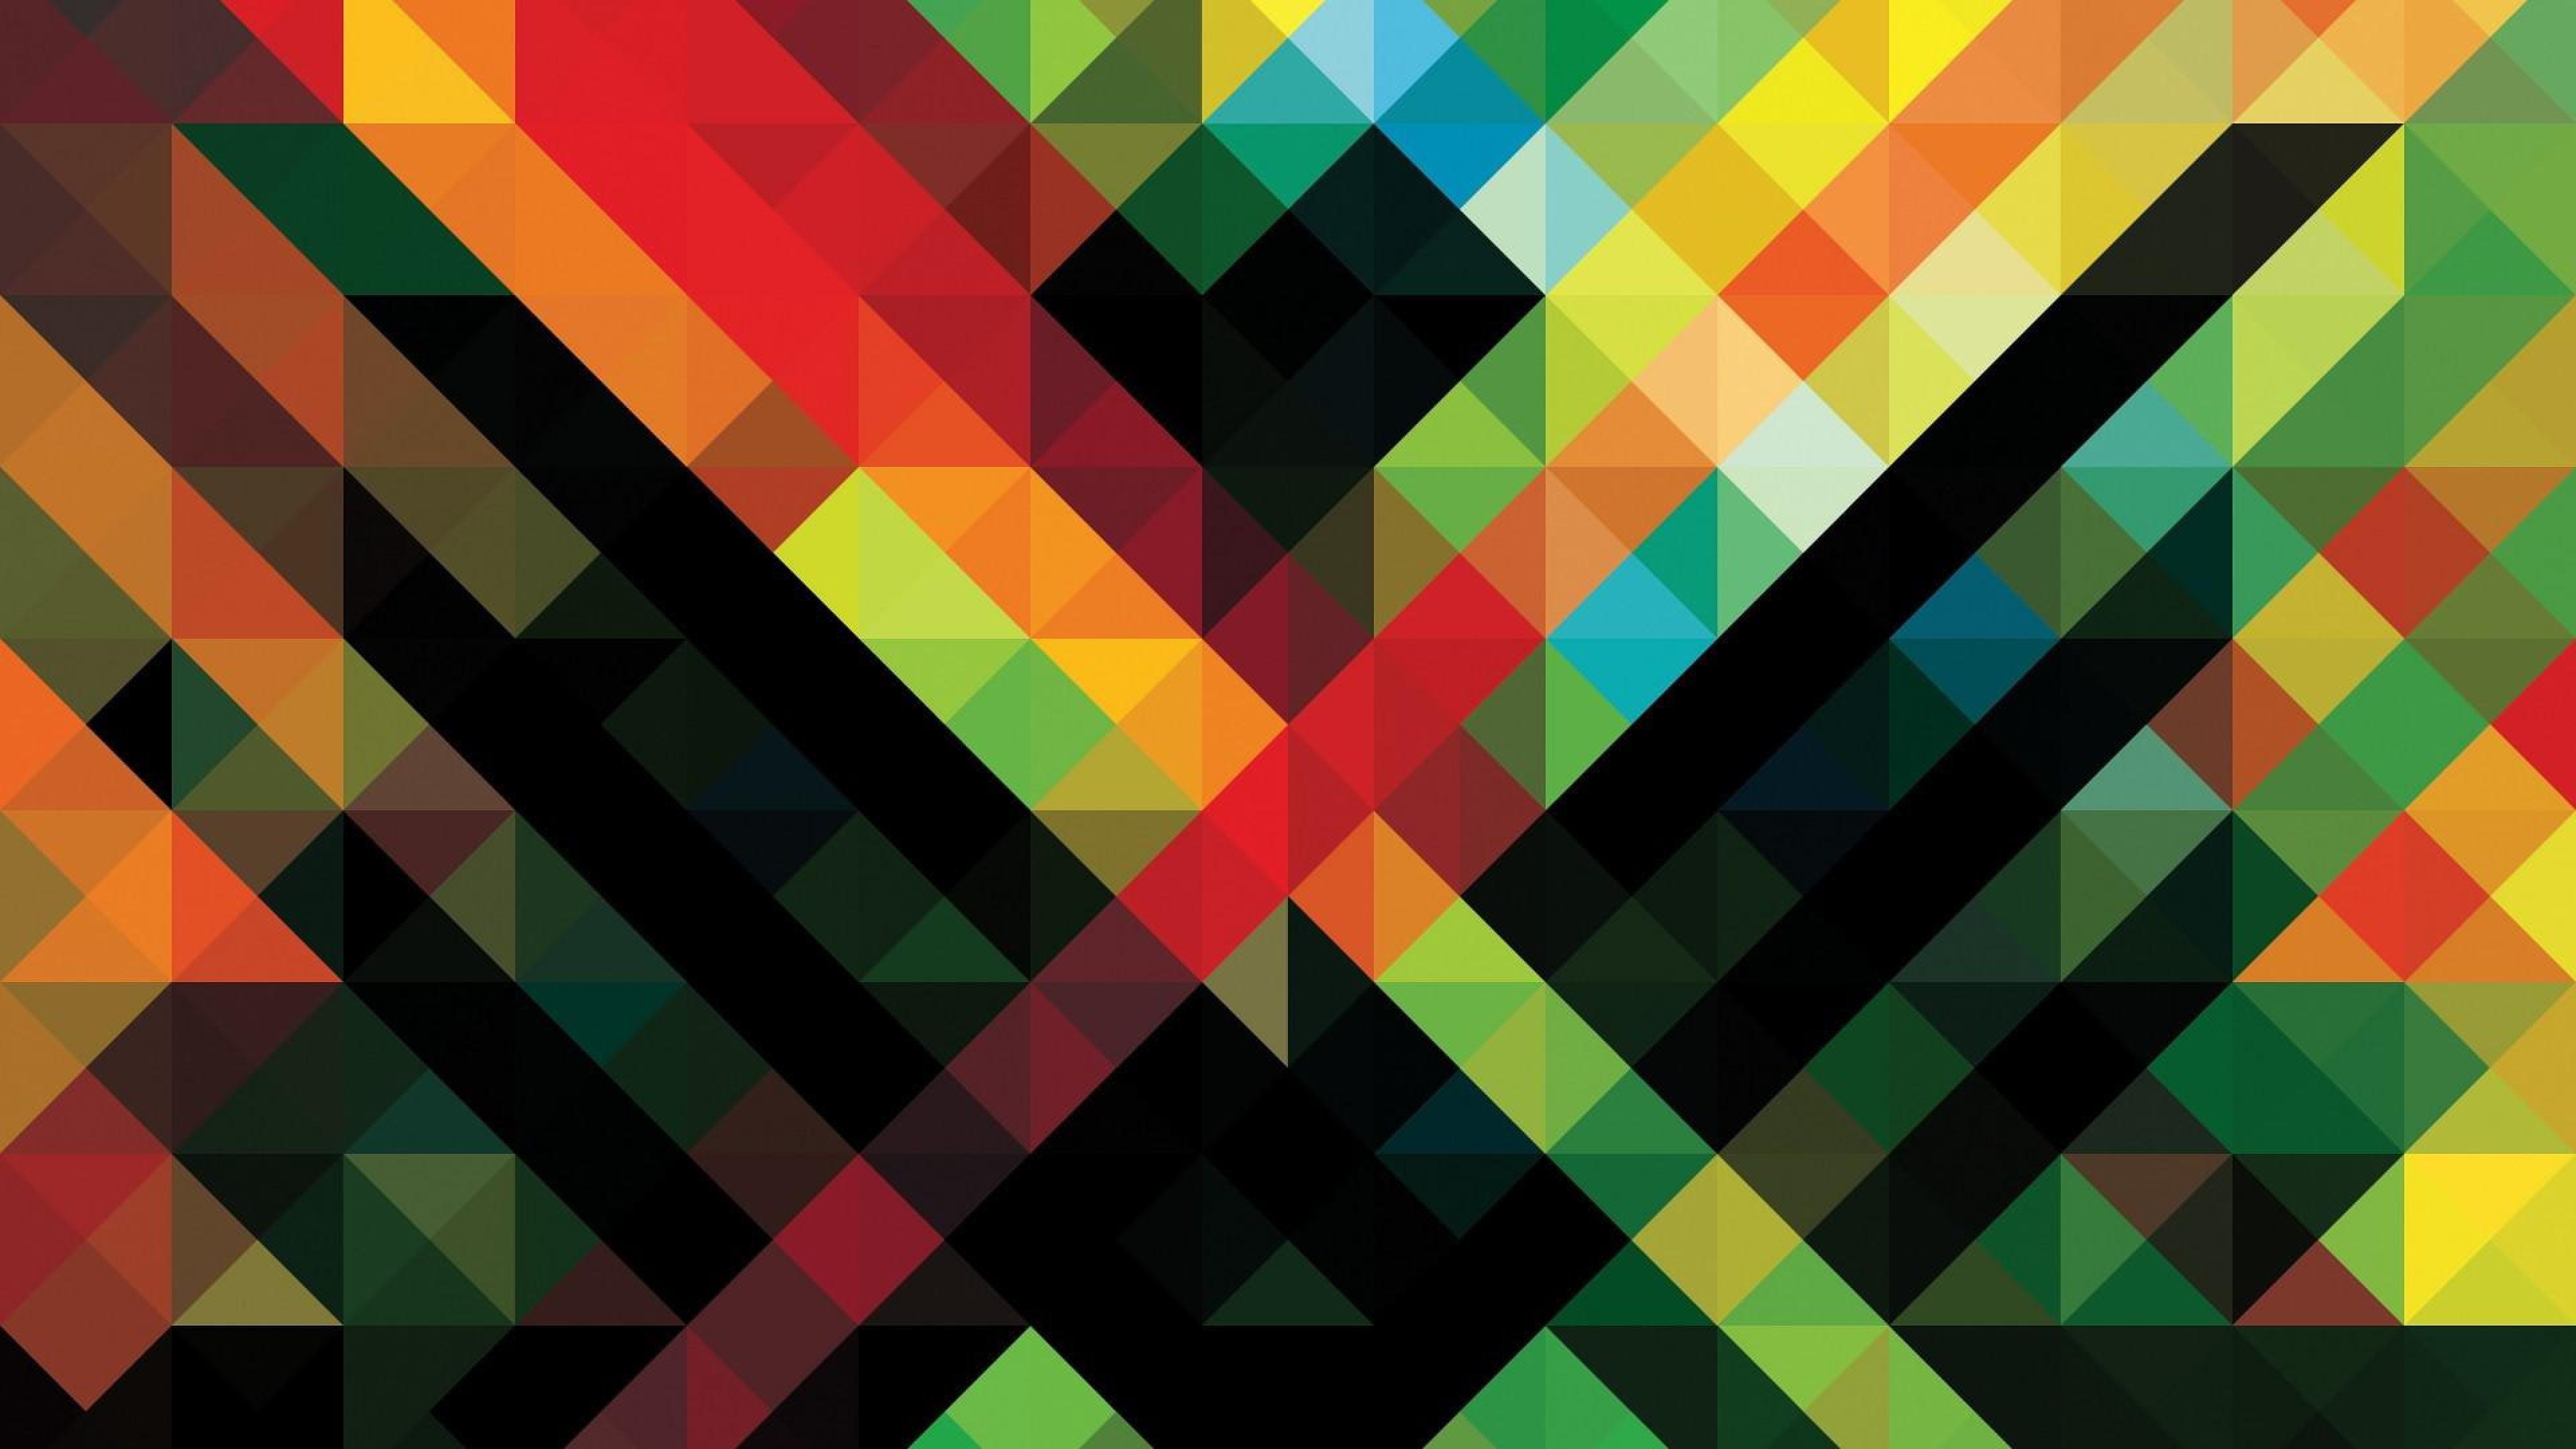 4k Geometric Wallpapers Top Free 4k Geometric Backgrounds